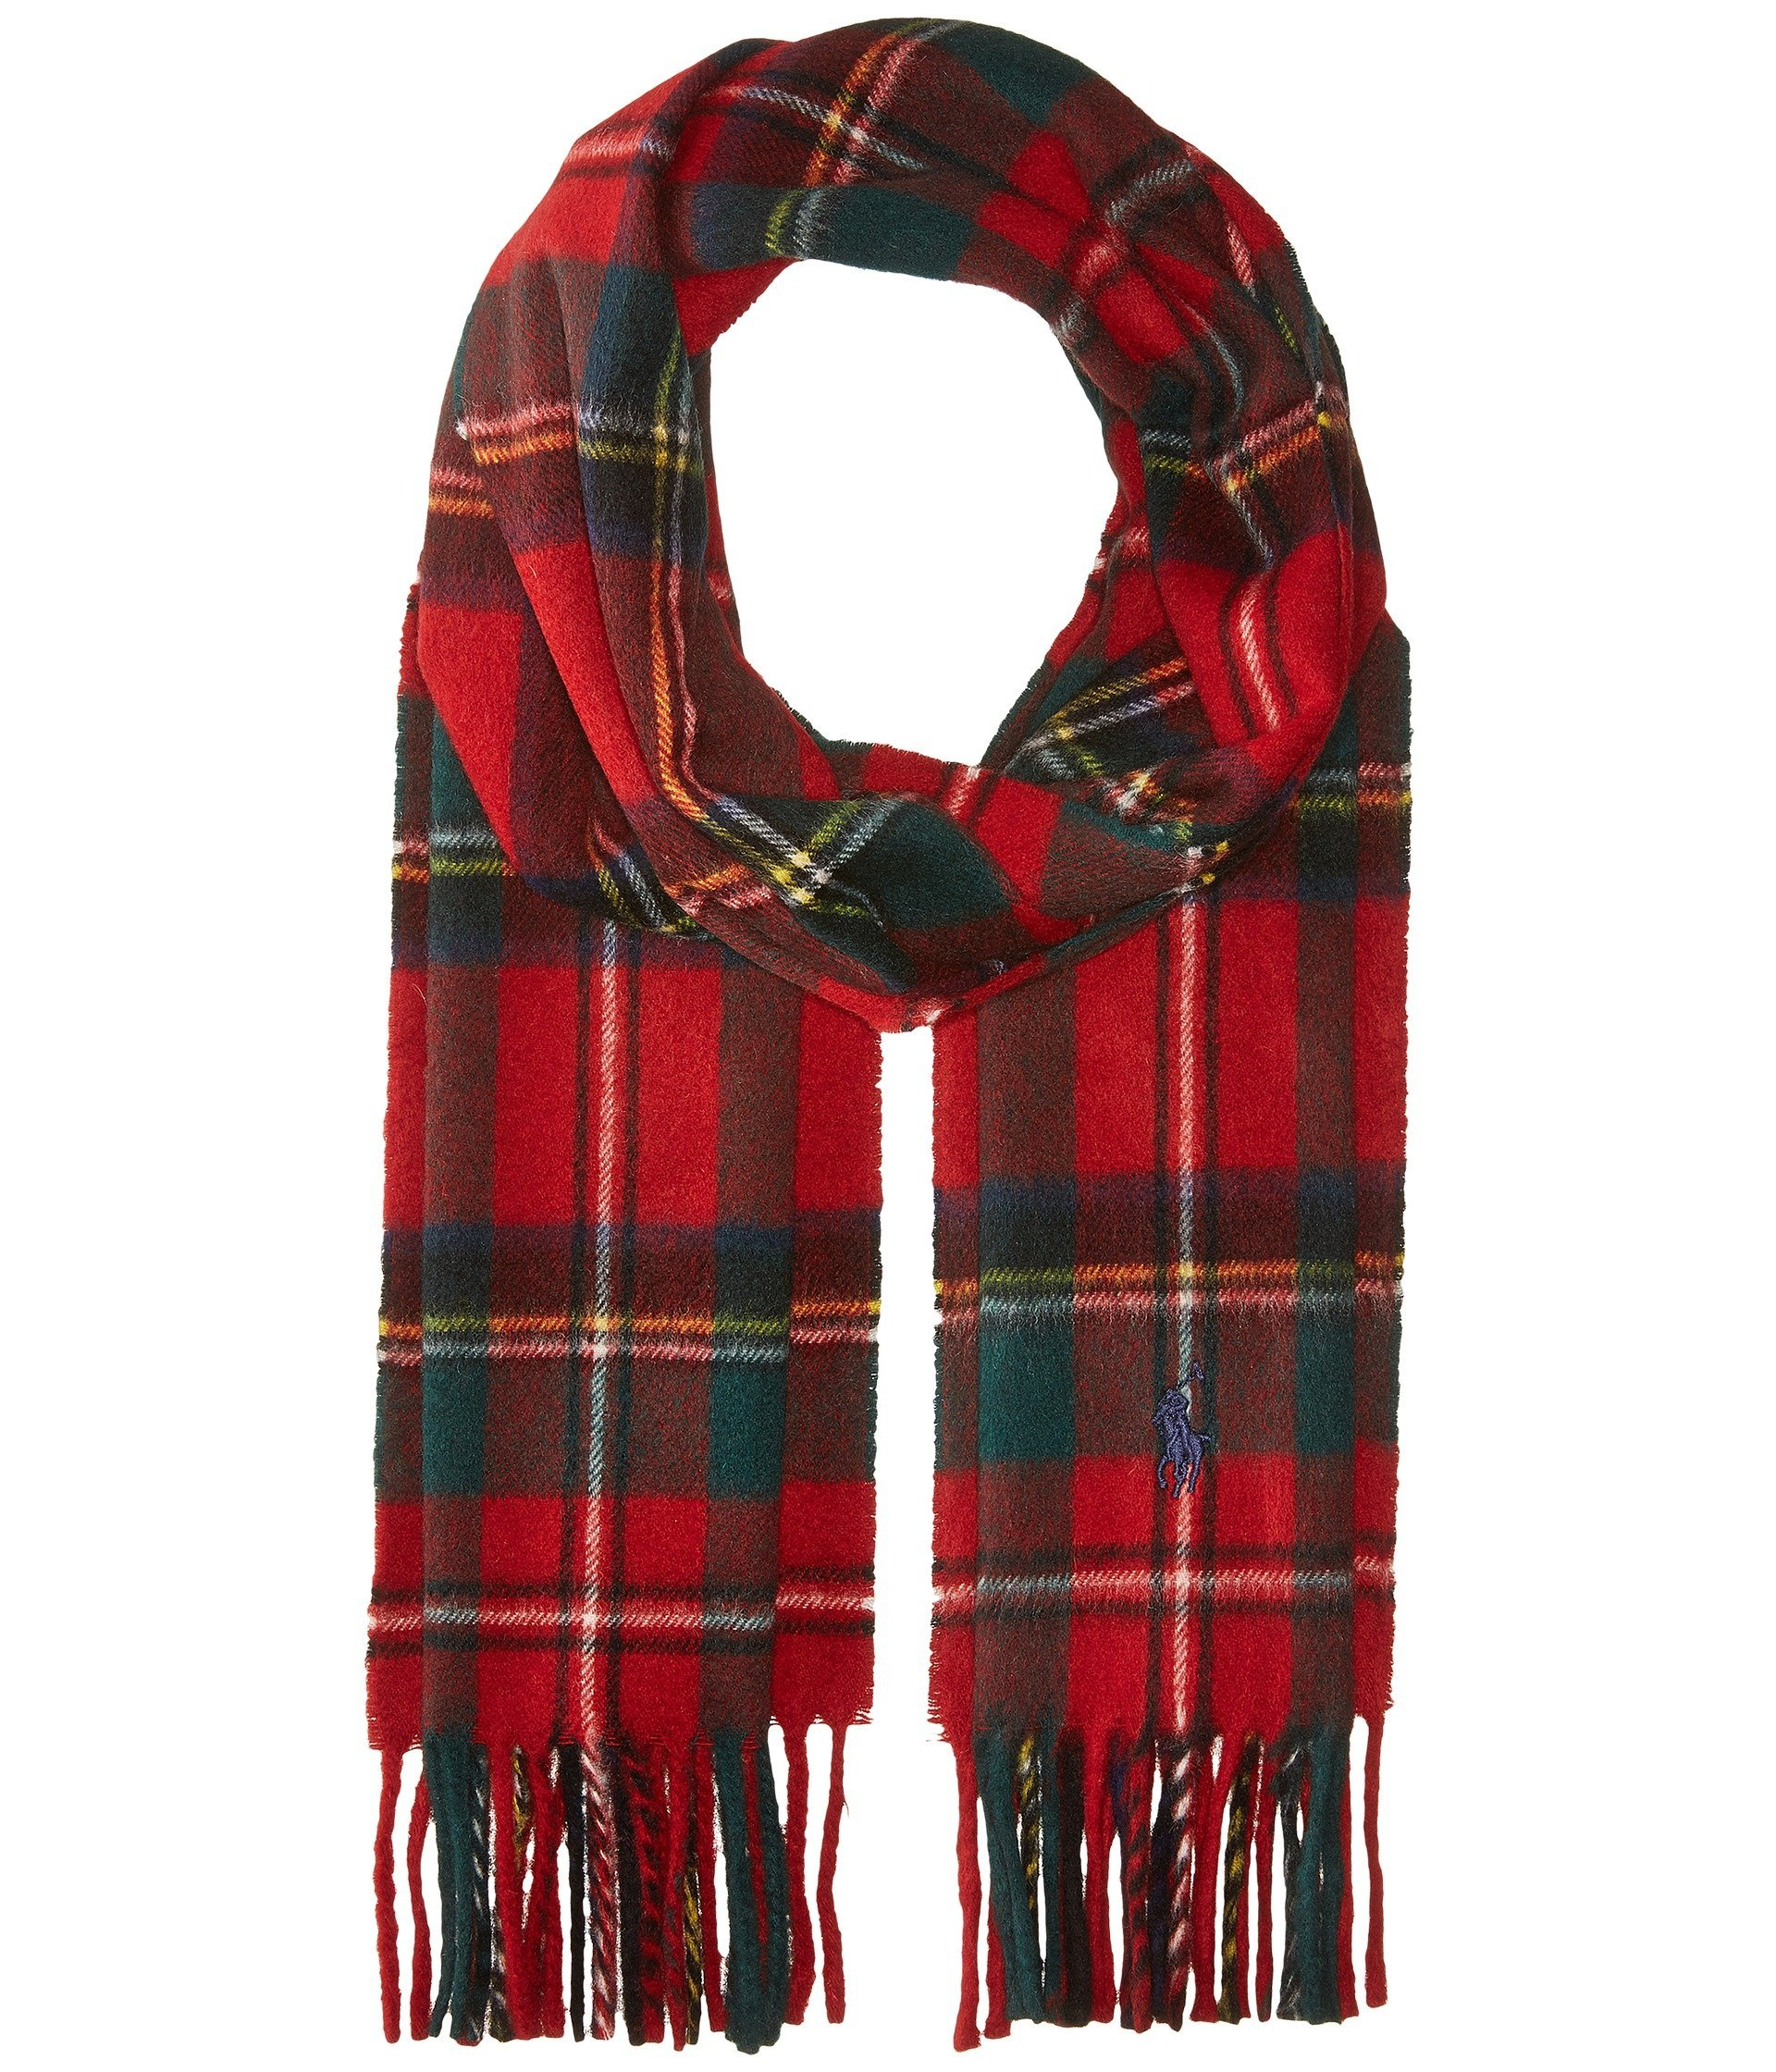 Polo Ralph Lauren Men`s Tartan Wool Scarf (Holiday Tartan (6F0529-619), One Size) by RALPH LAUREN (Image #1)